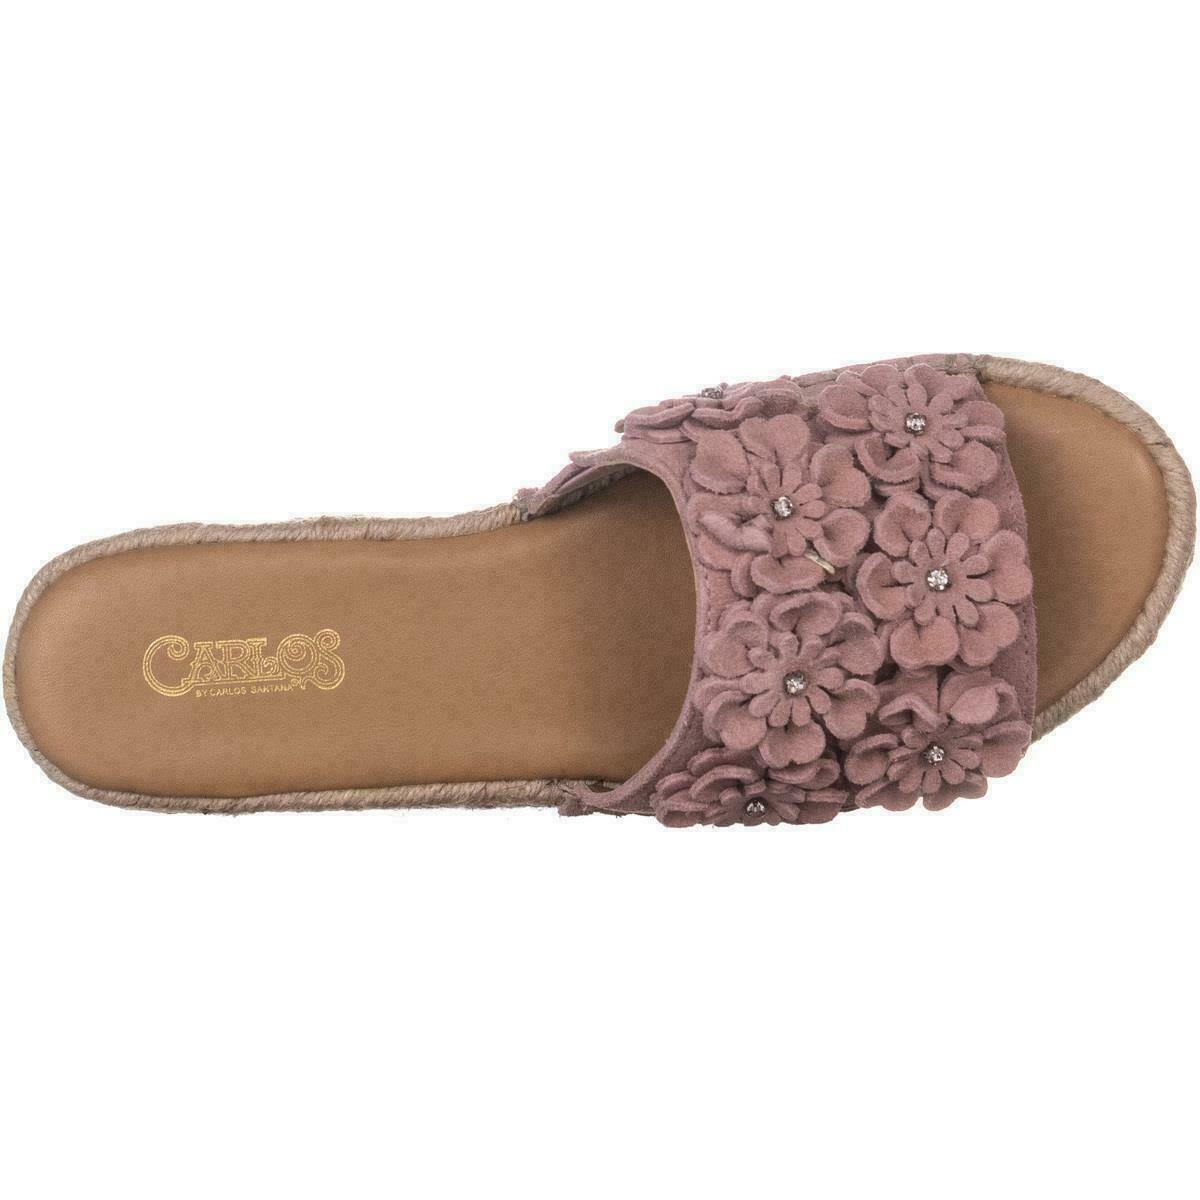 Carlos by Carlos Santana Chandler Sandals Pink Blush, Size 7 M